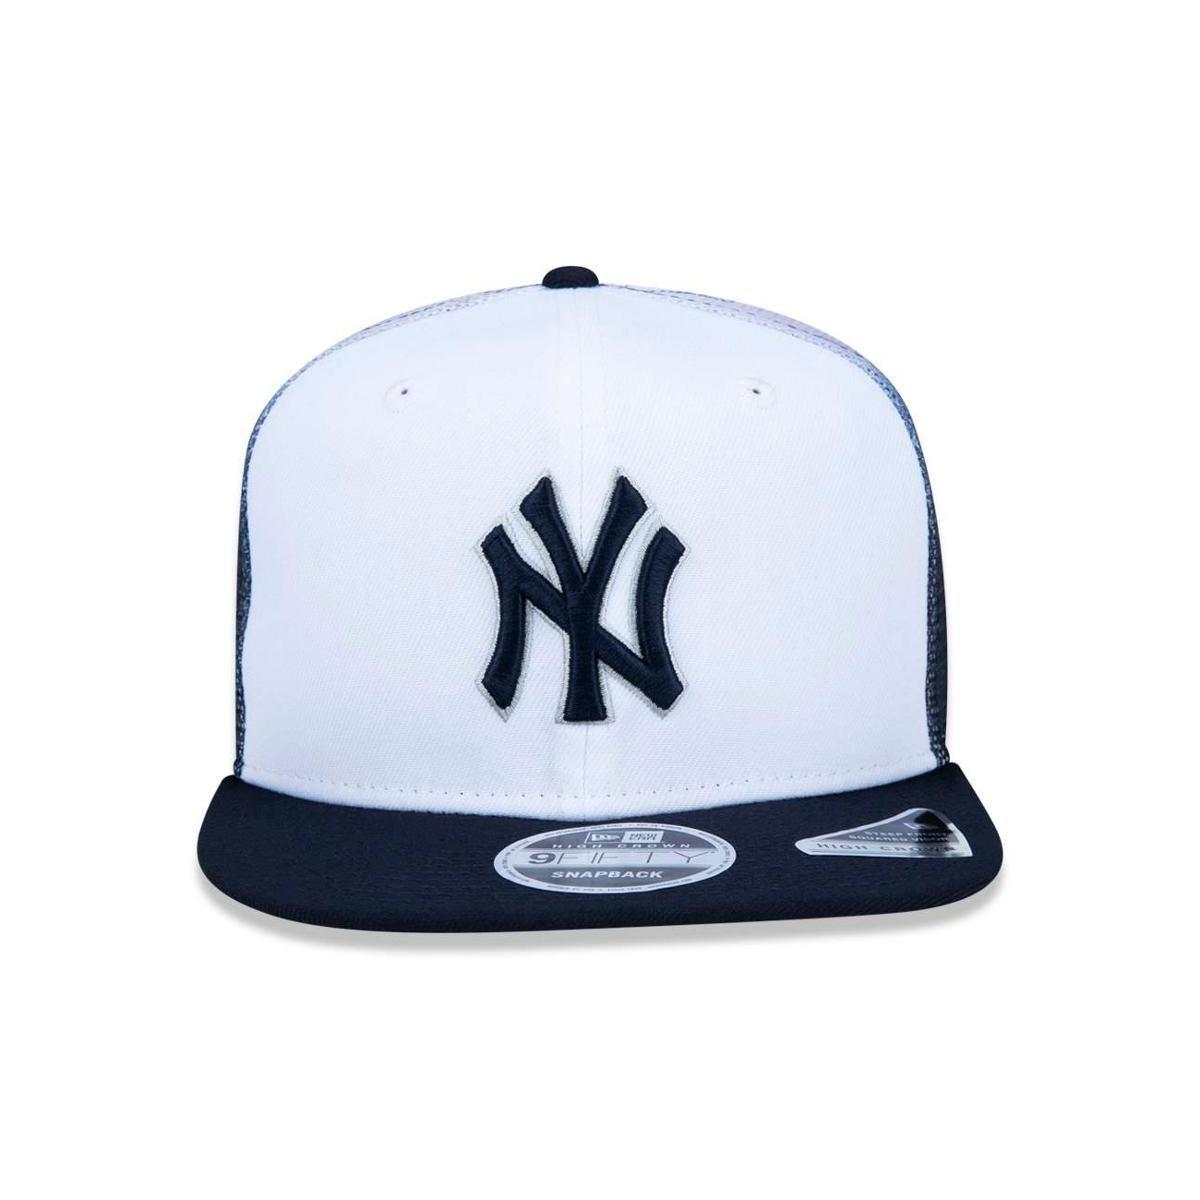 Boné 920 New York Yankees MLB Aba Curva New Era - Compre Agora ... 3a2b15162f4cf